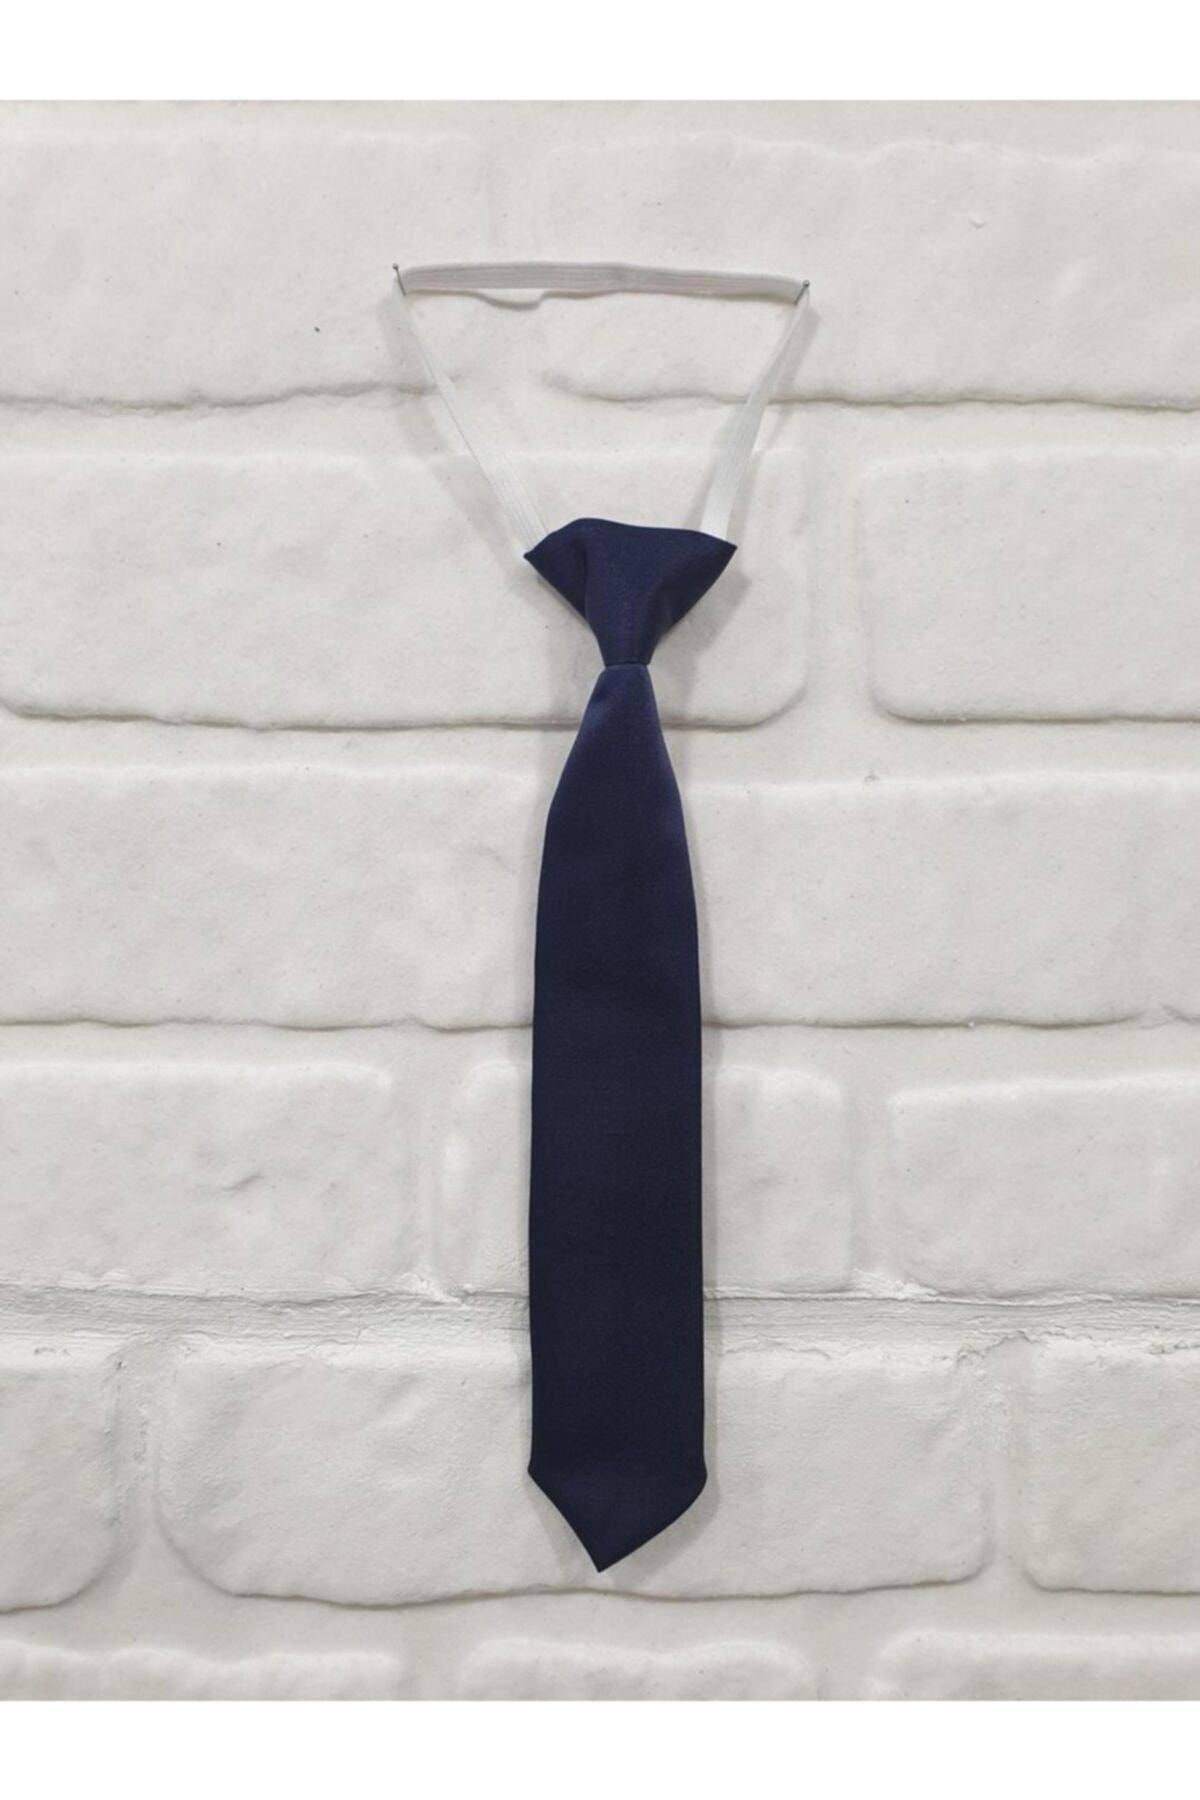 کراوات فانتزی بچه گانه پسرانه برند ÜN-KO رنگ لاجوردی کد ty105119520